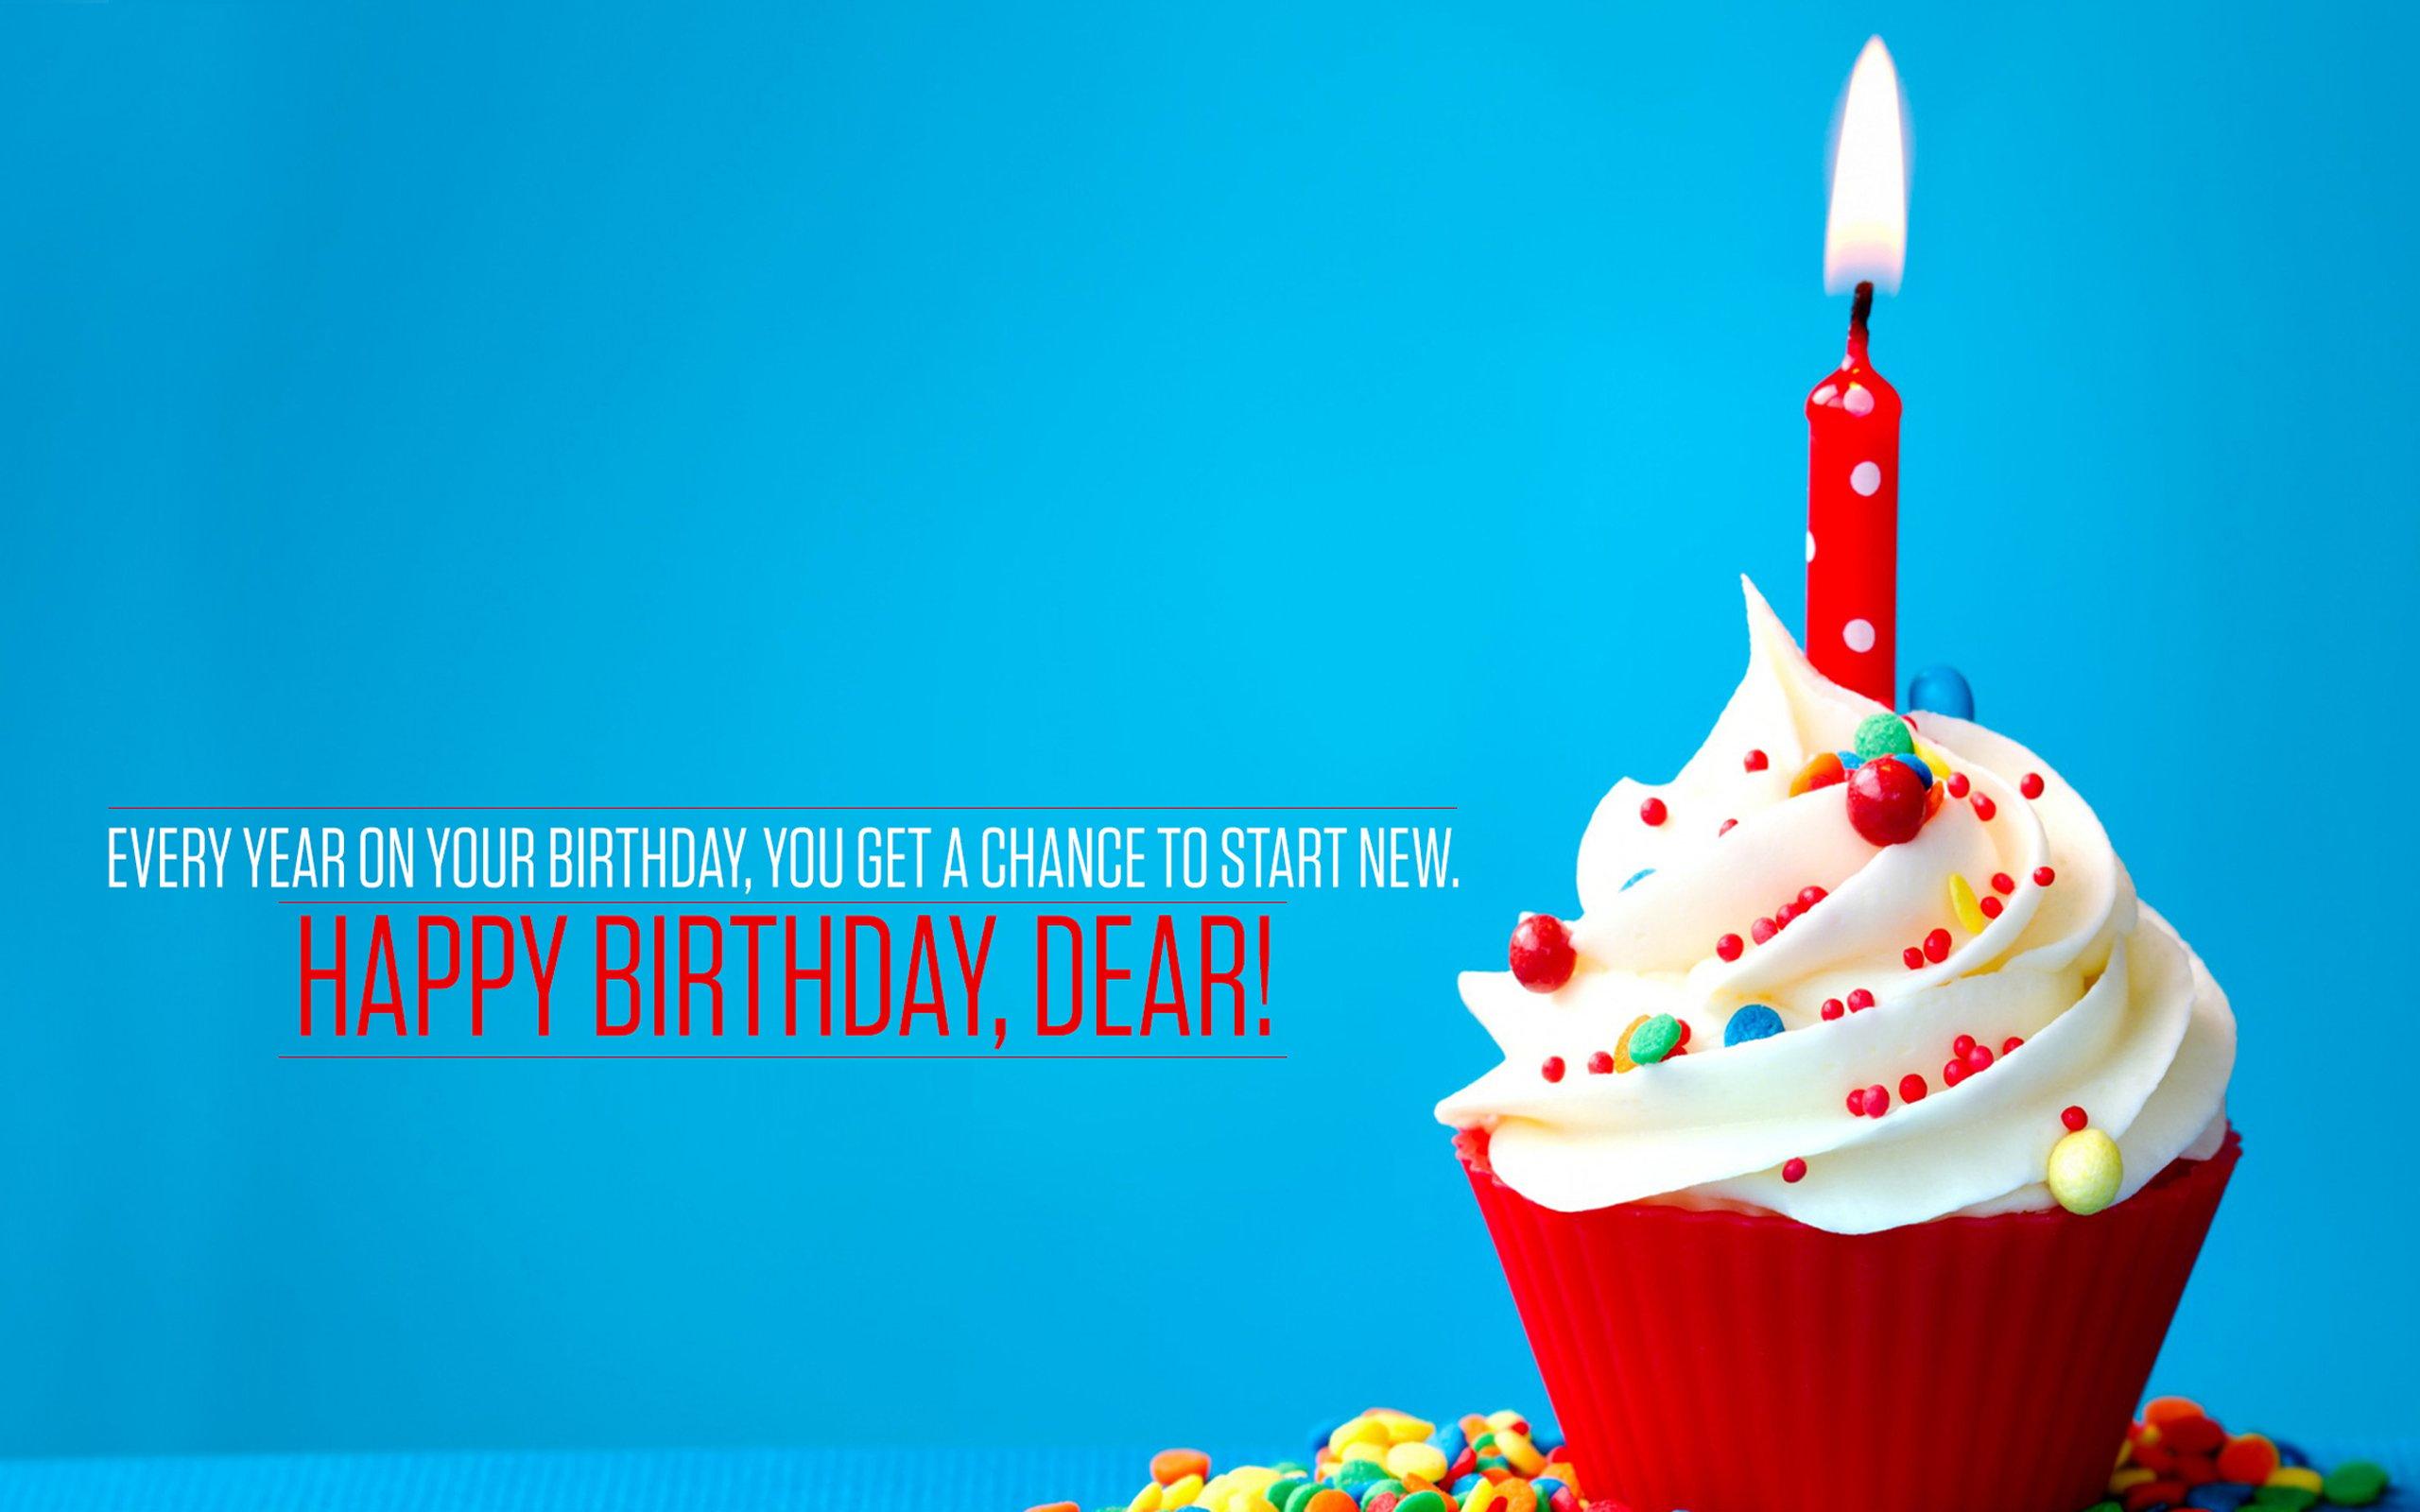 Hd wallpaper birthday - Happy Birthday Wishes Hd Wallpaper Only Hd Wallpapers Happy Birthd